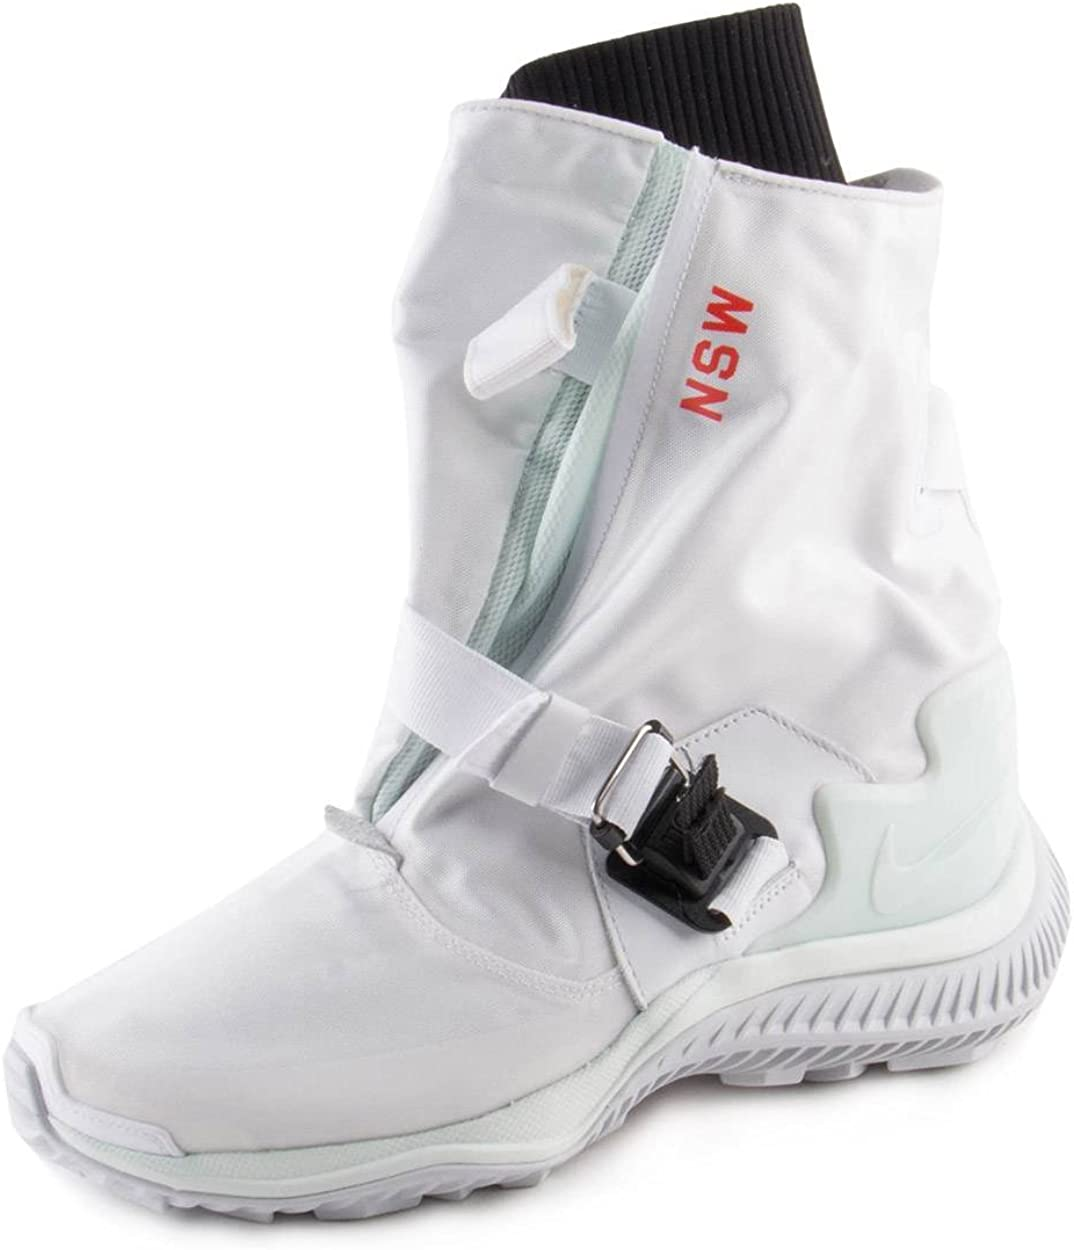 Borrar código Escrupuloso  Amazon.com   Nike Womens WMNS NSW Gaiter Boot White/Barley Green Nylon Size  5   Boots